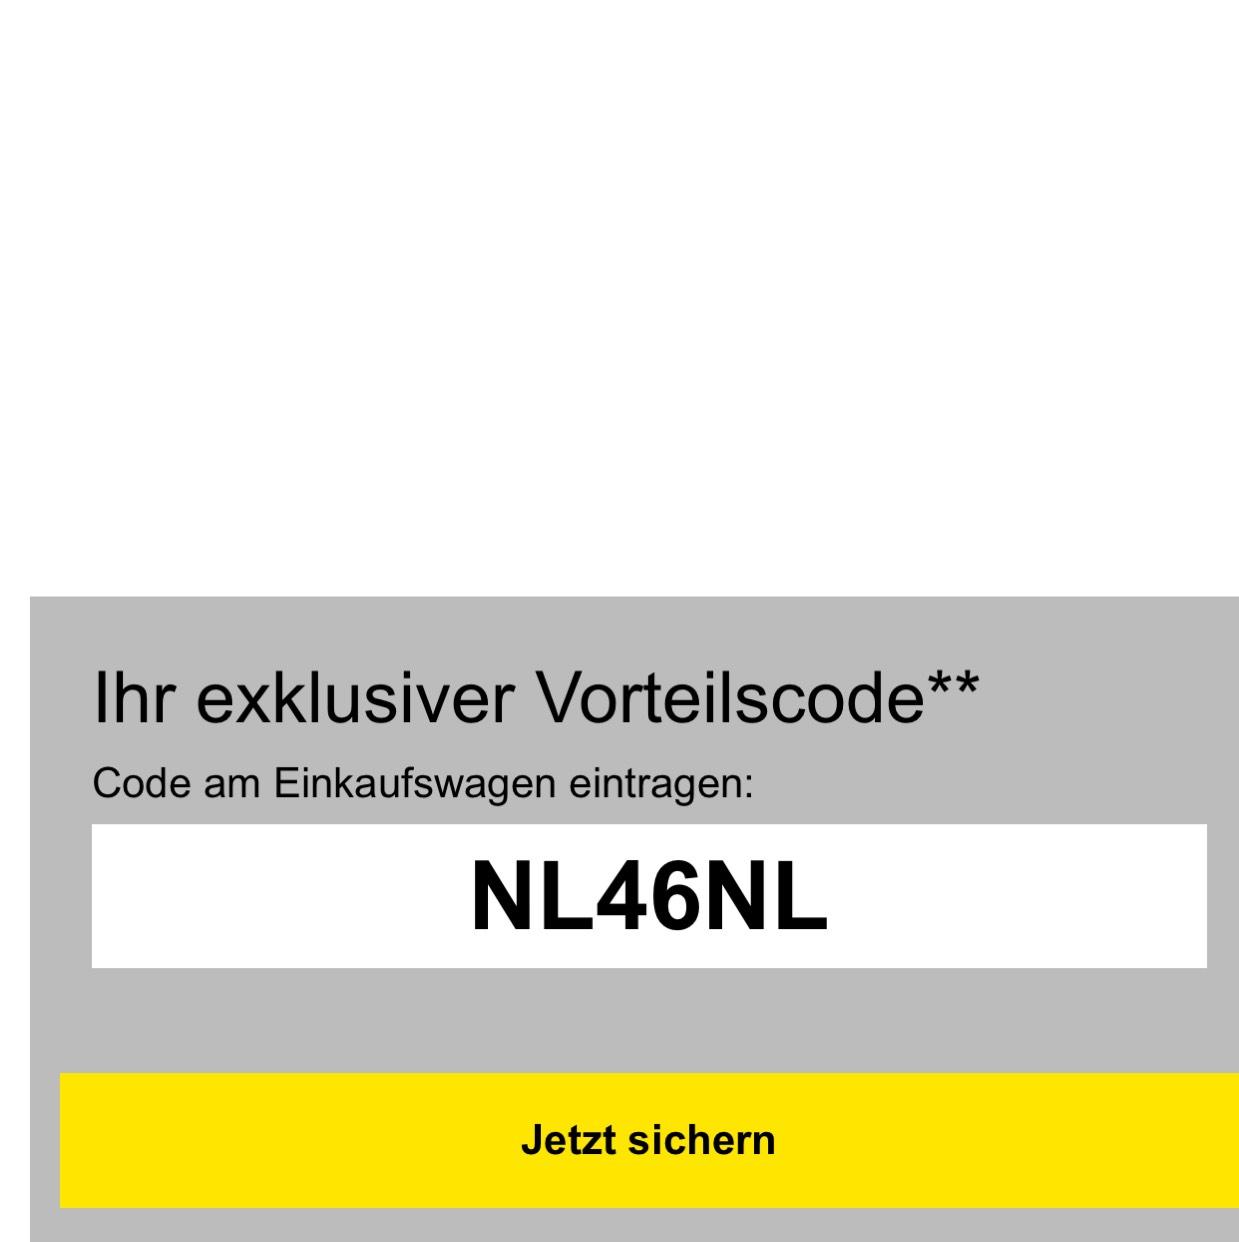 15355486-Us4cR.jpg